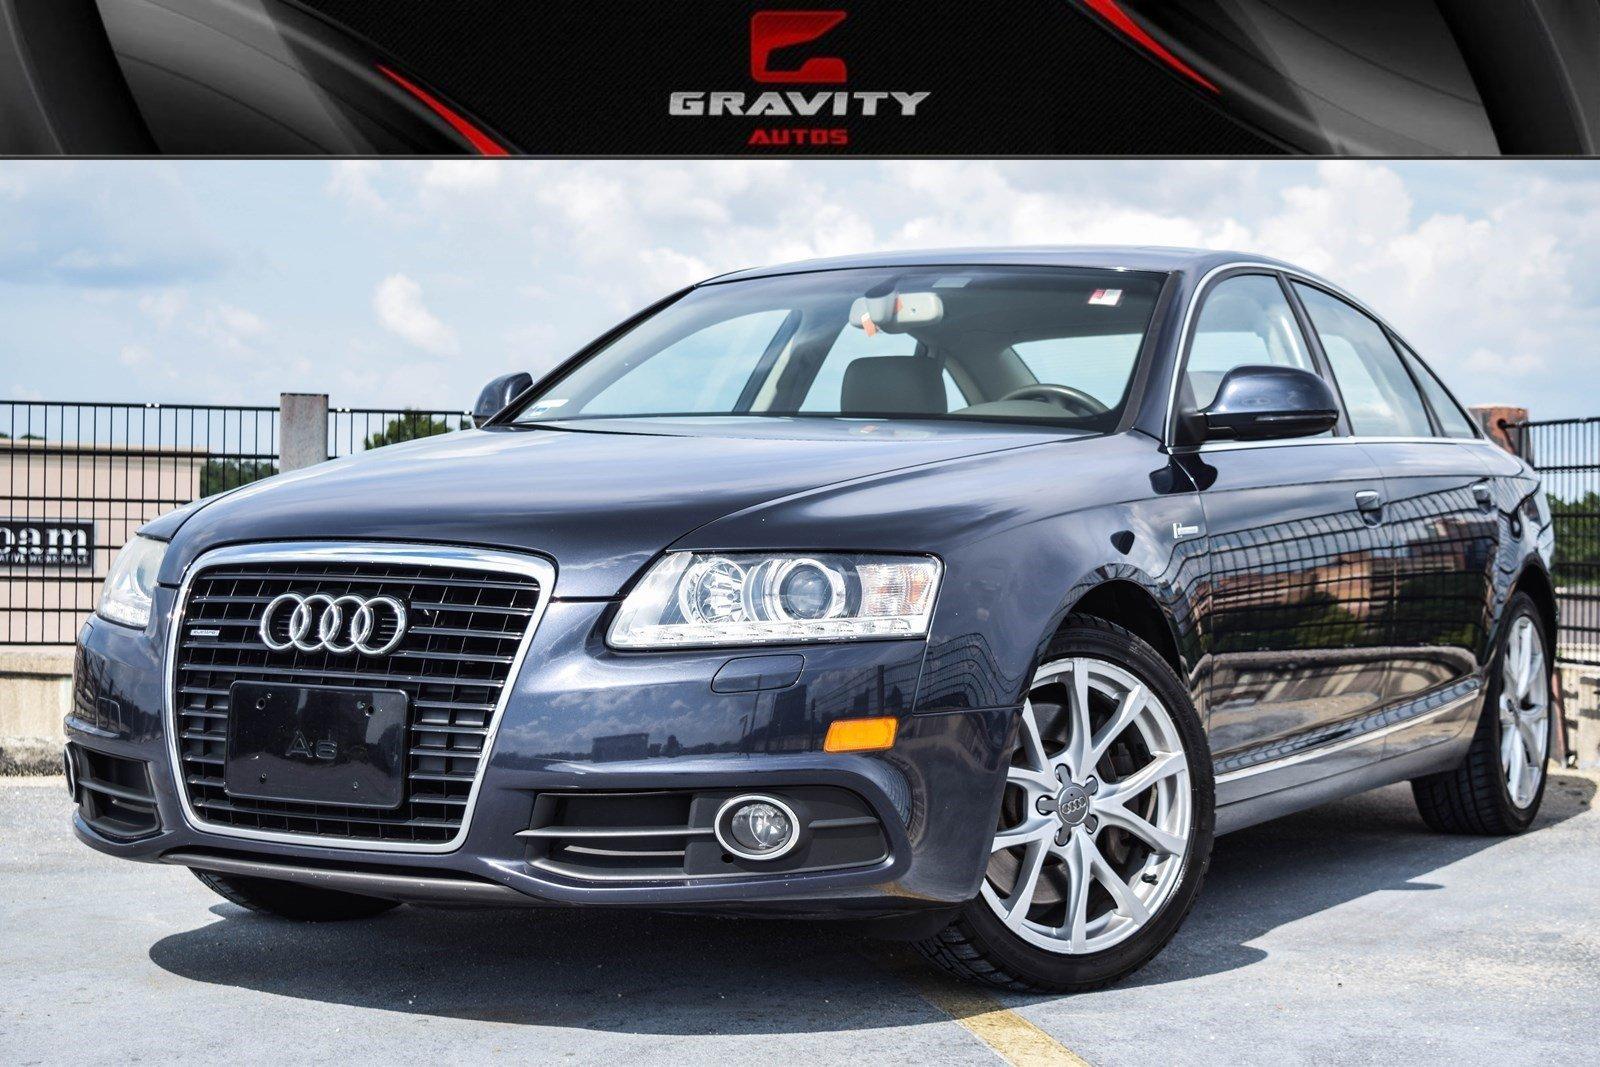 2011 Audi A6 3 0t Premium Plus Stock 010531 For Sale Near Sandy Springs Ga Ga Audi Dealer